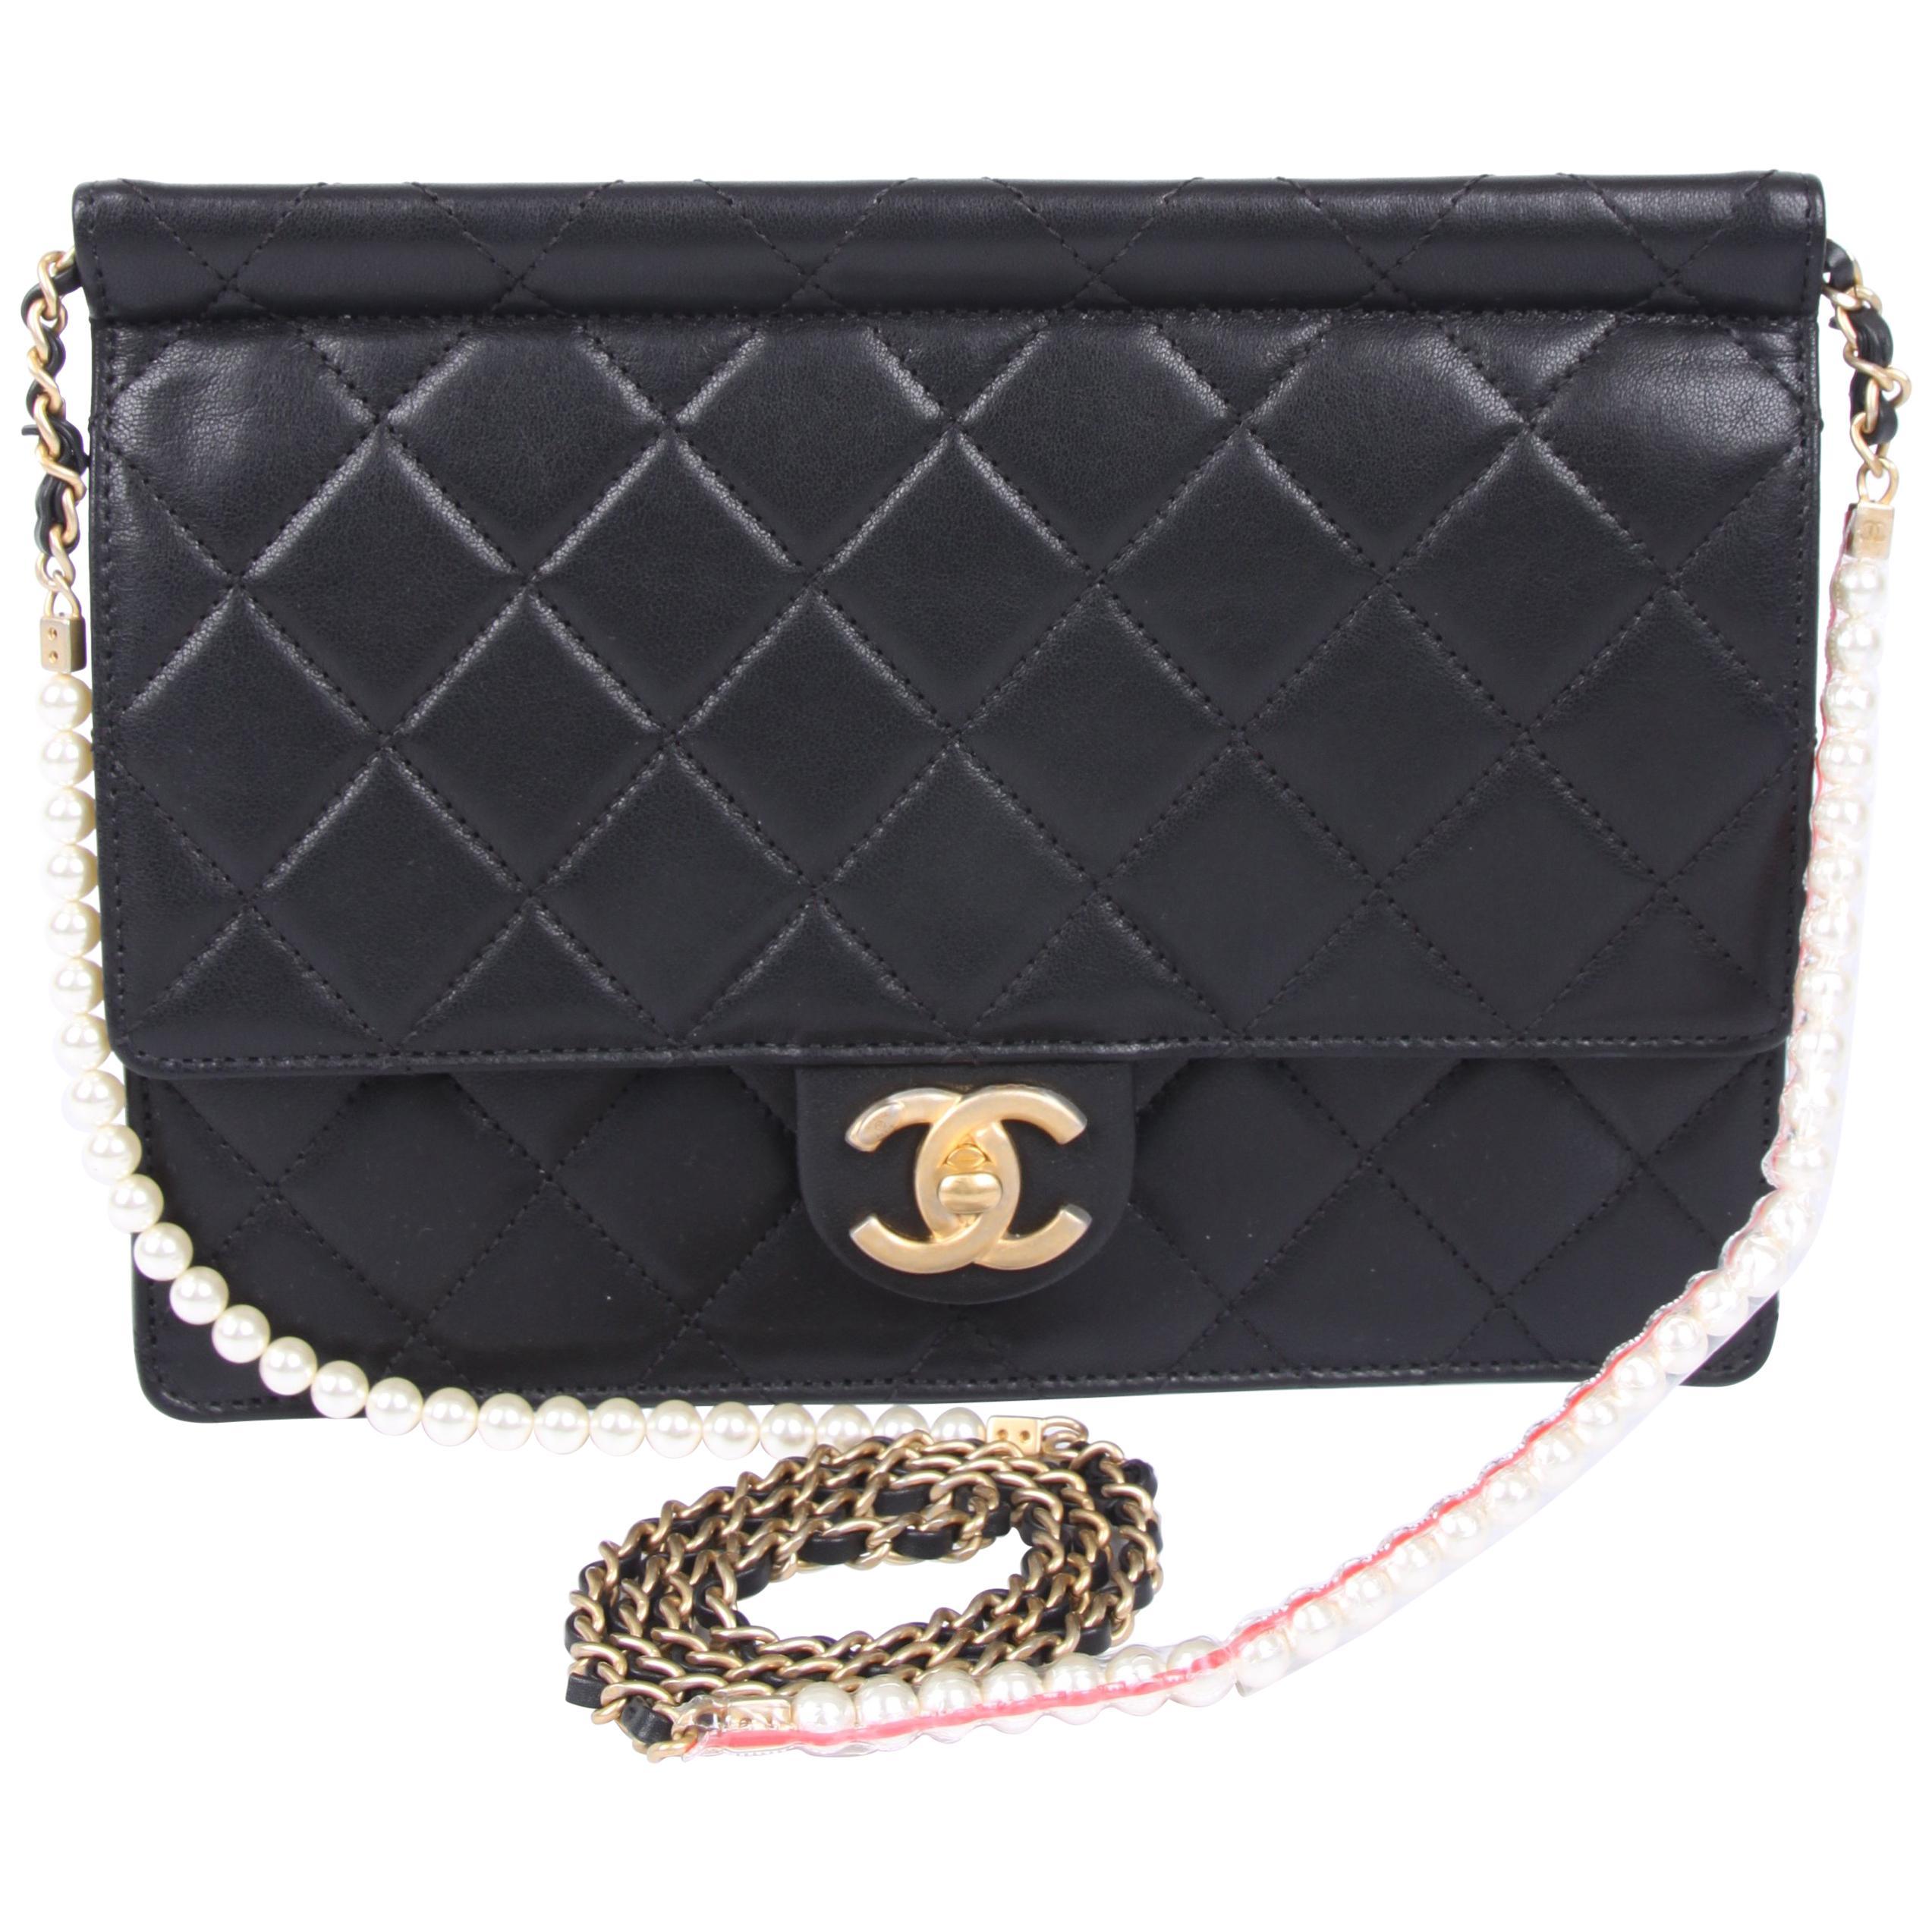 e60004bebe3e Vintage and Designer Bags - 24